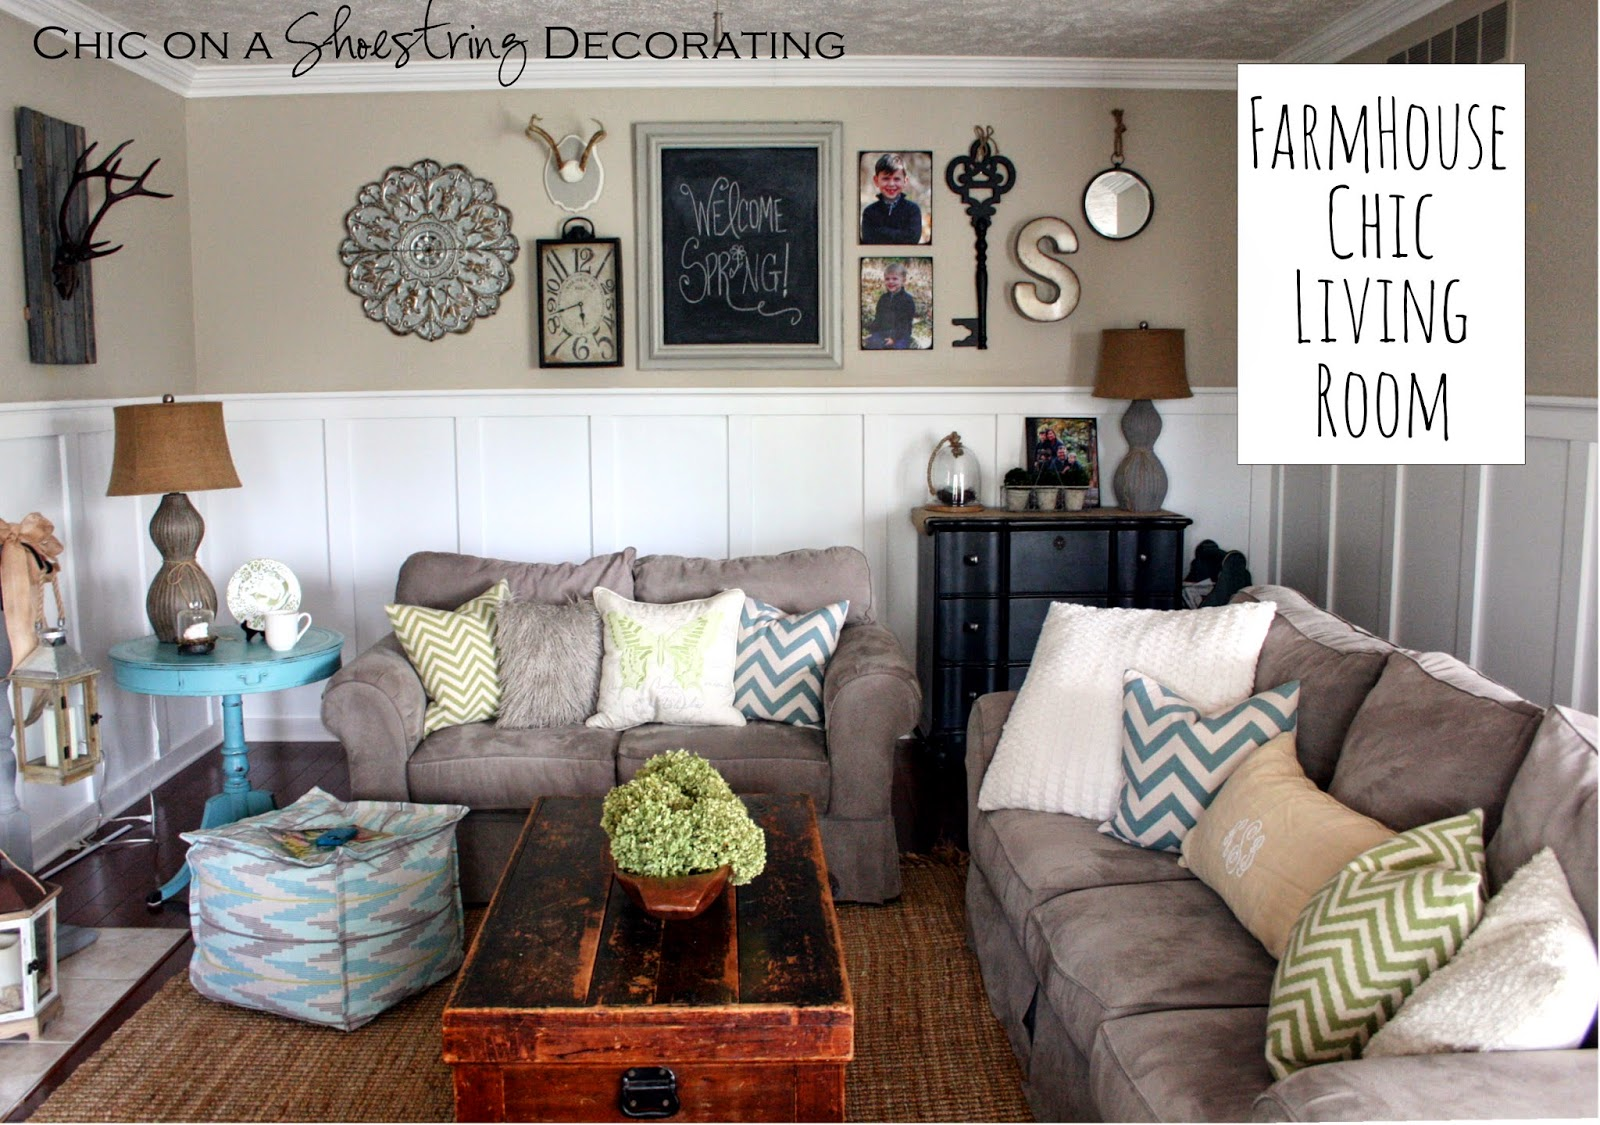 Farmhouse Living Room Decorating Ideas | Zion Modern House